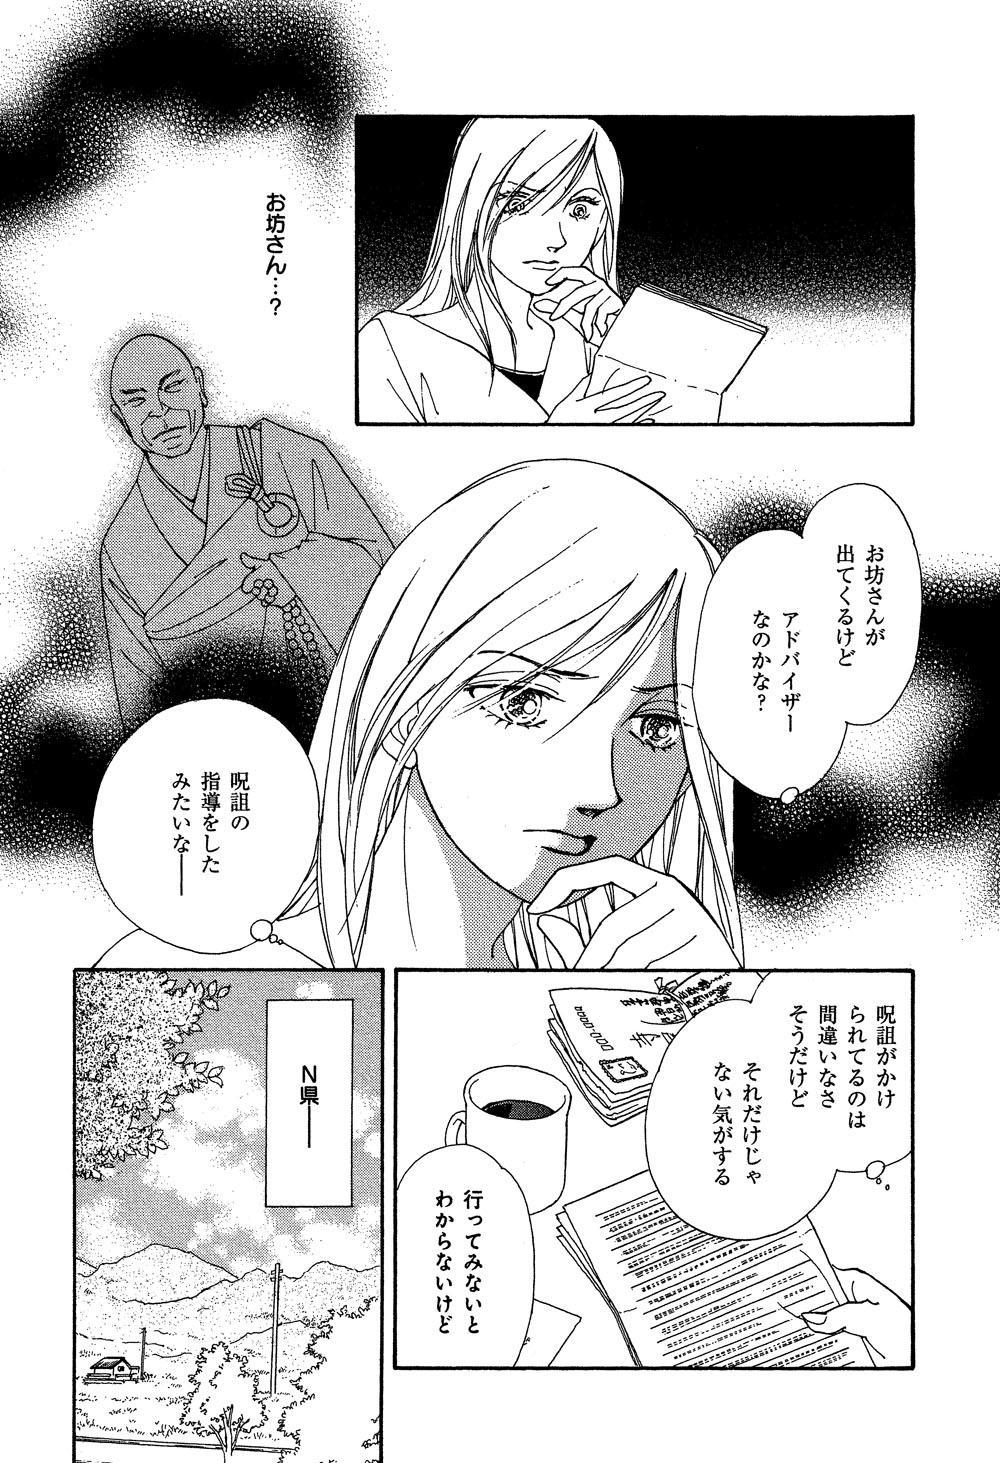 mayuri_0001_0145.jpg